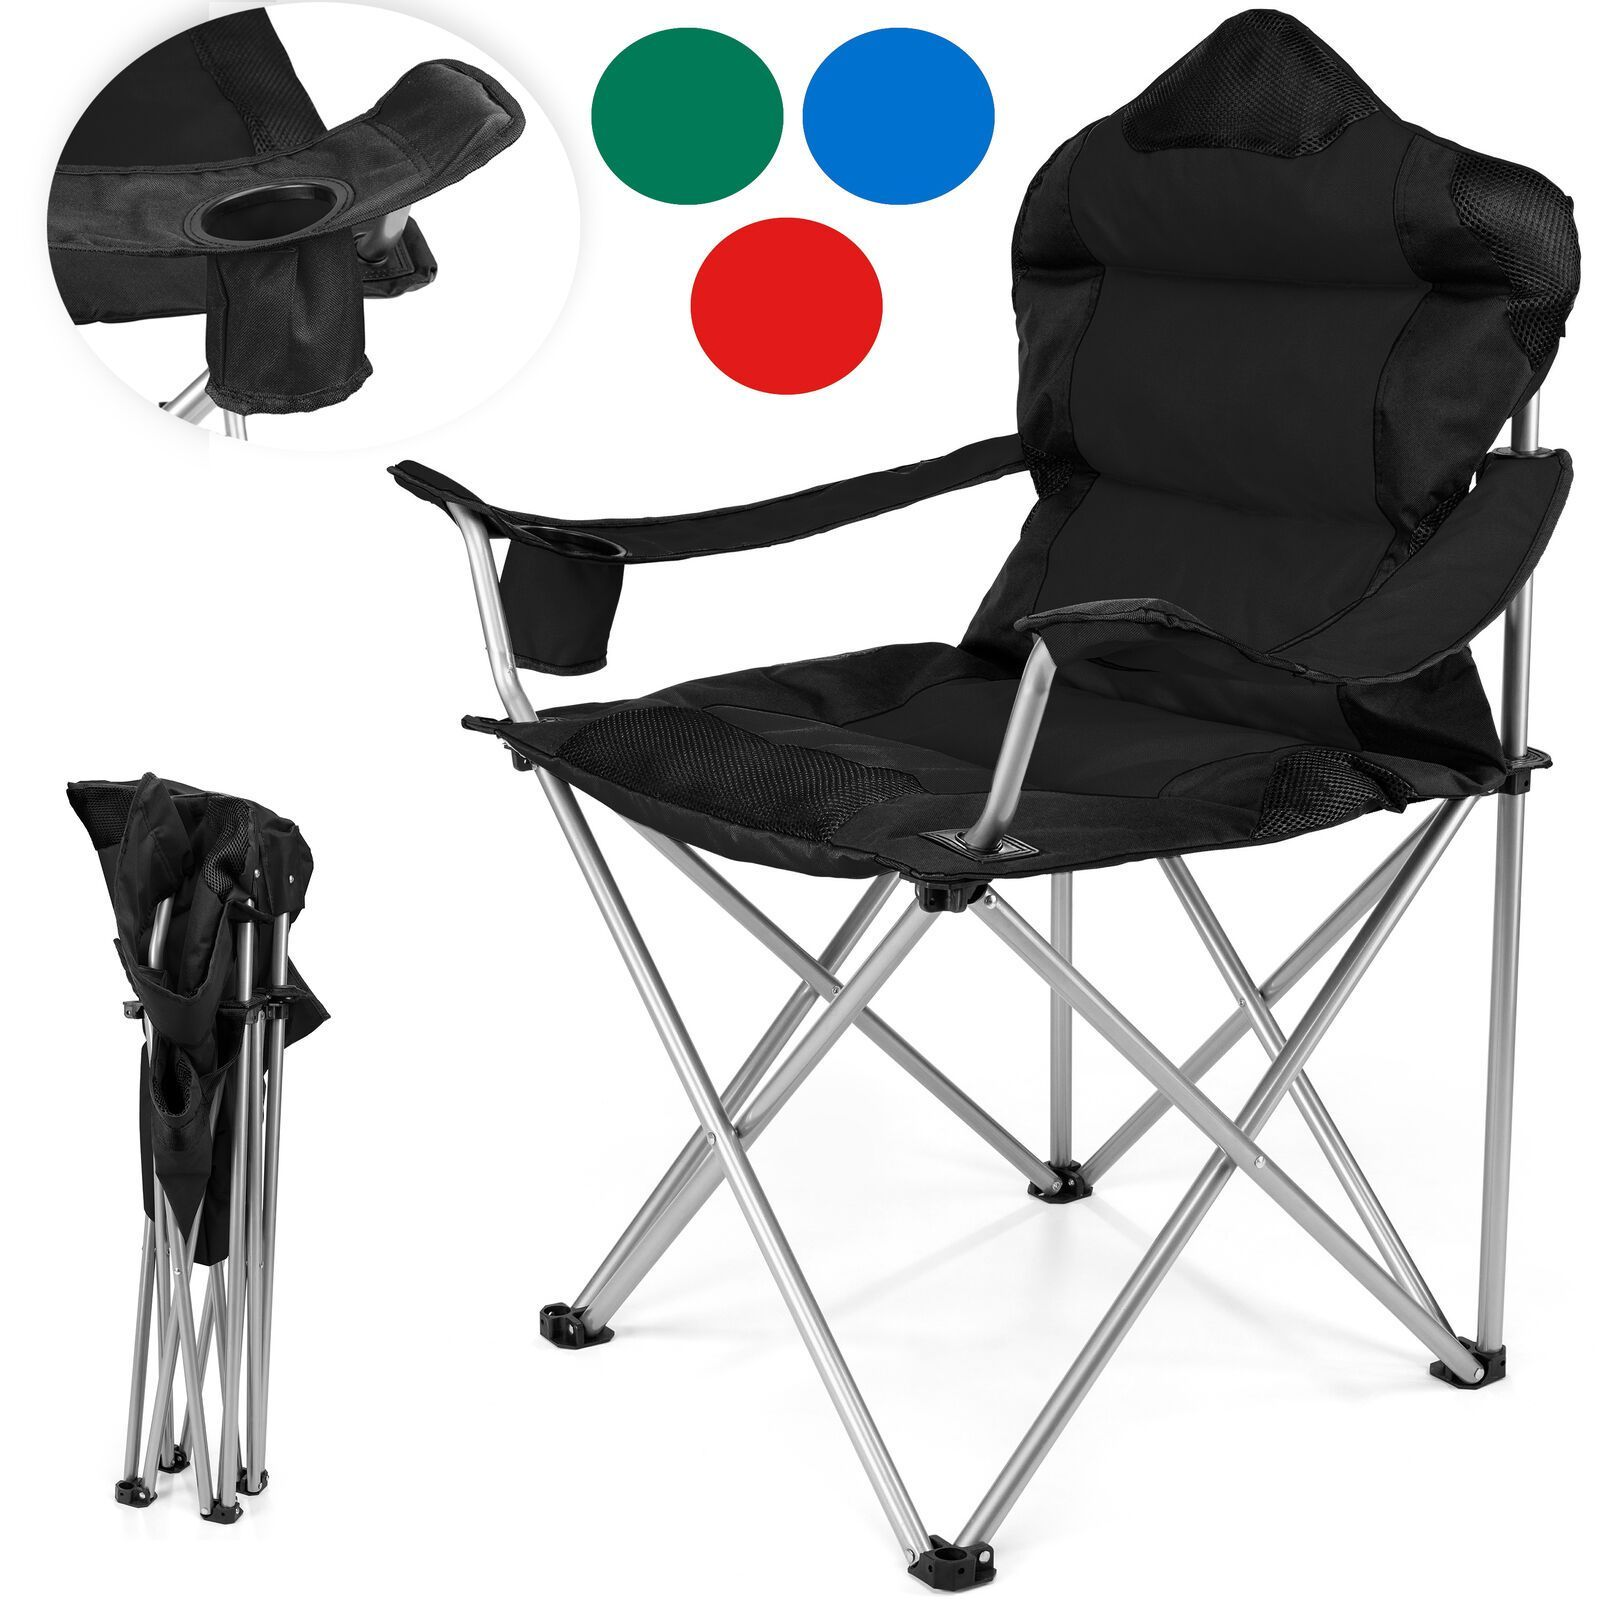 Campingstuhl Angelstuhl Faltstuhl Klappstuhl Regiestuhl Anglerstuhl Gepolstert Ebay Folding Chair Butterfly Chair Outdoor Chairs